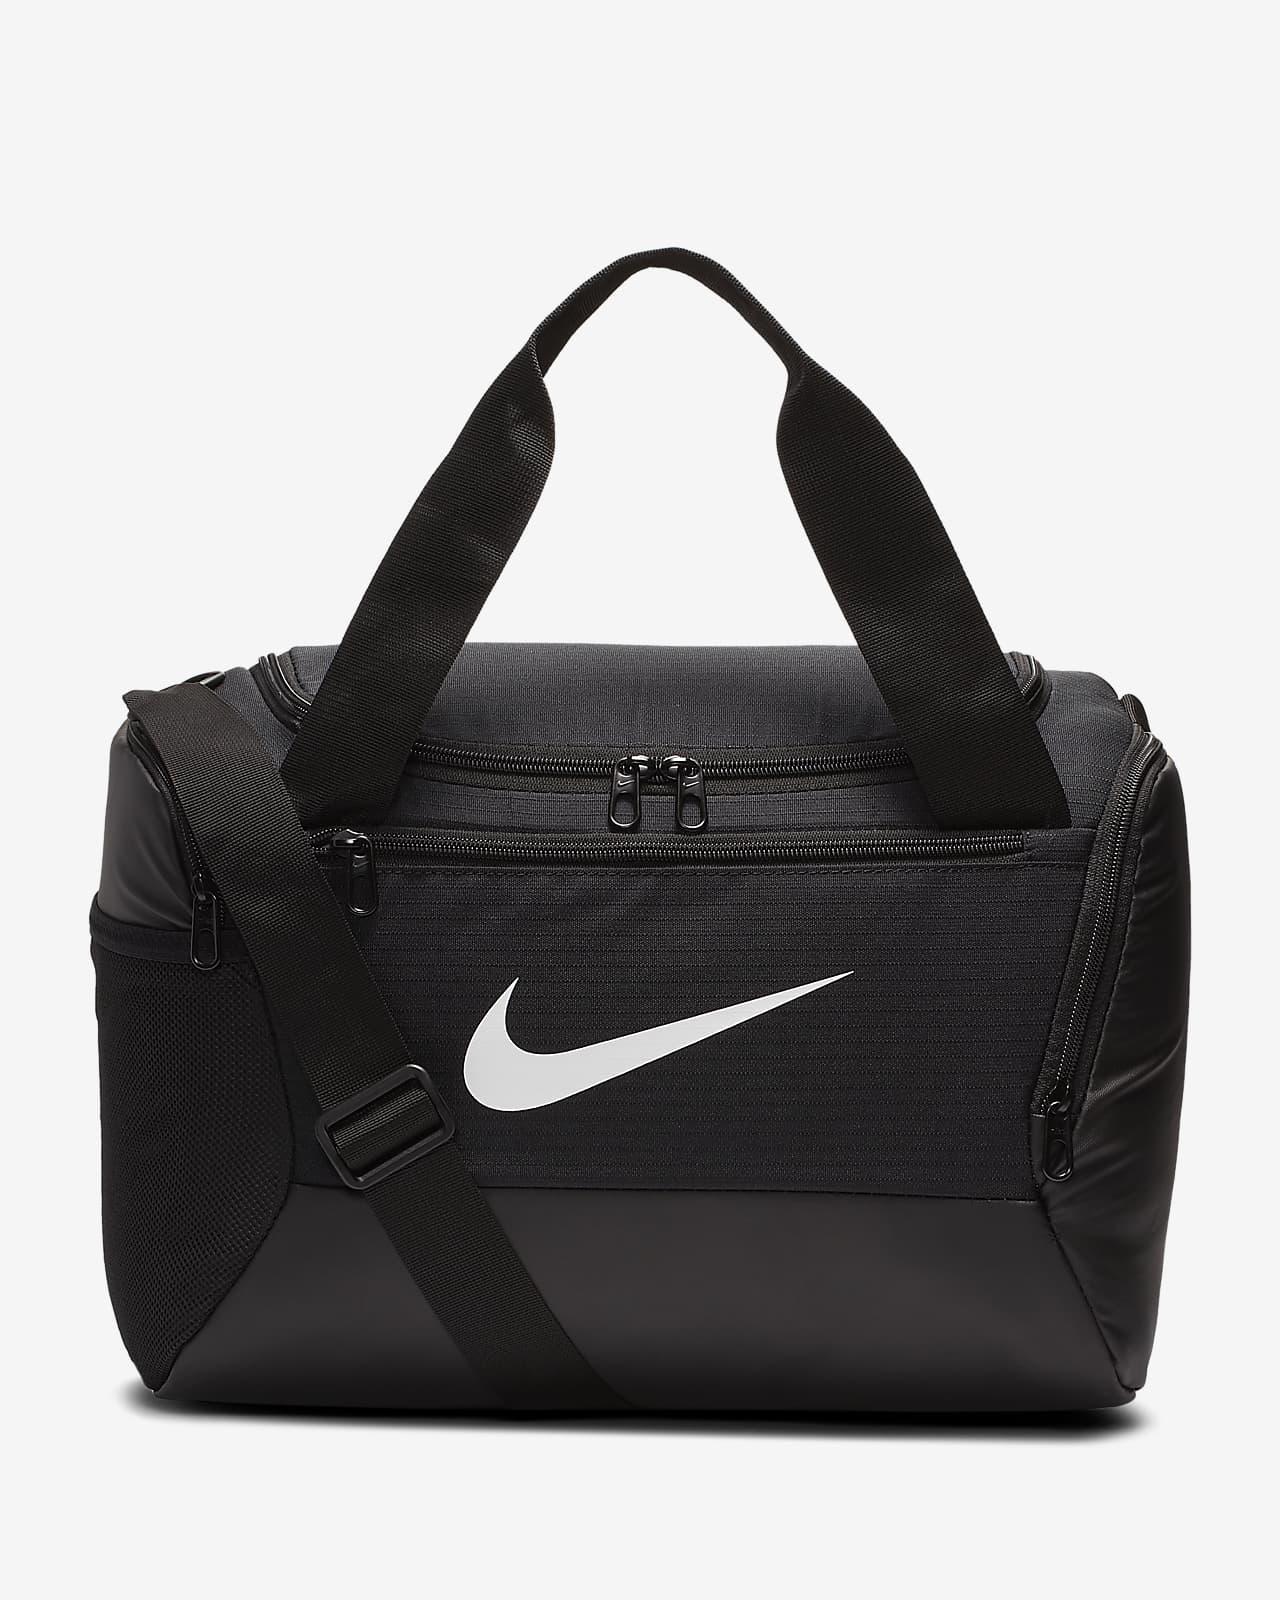 Sportbag Nike Brasilia (Extra Small)